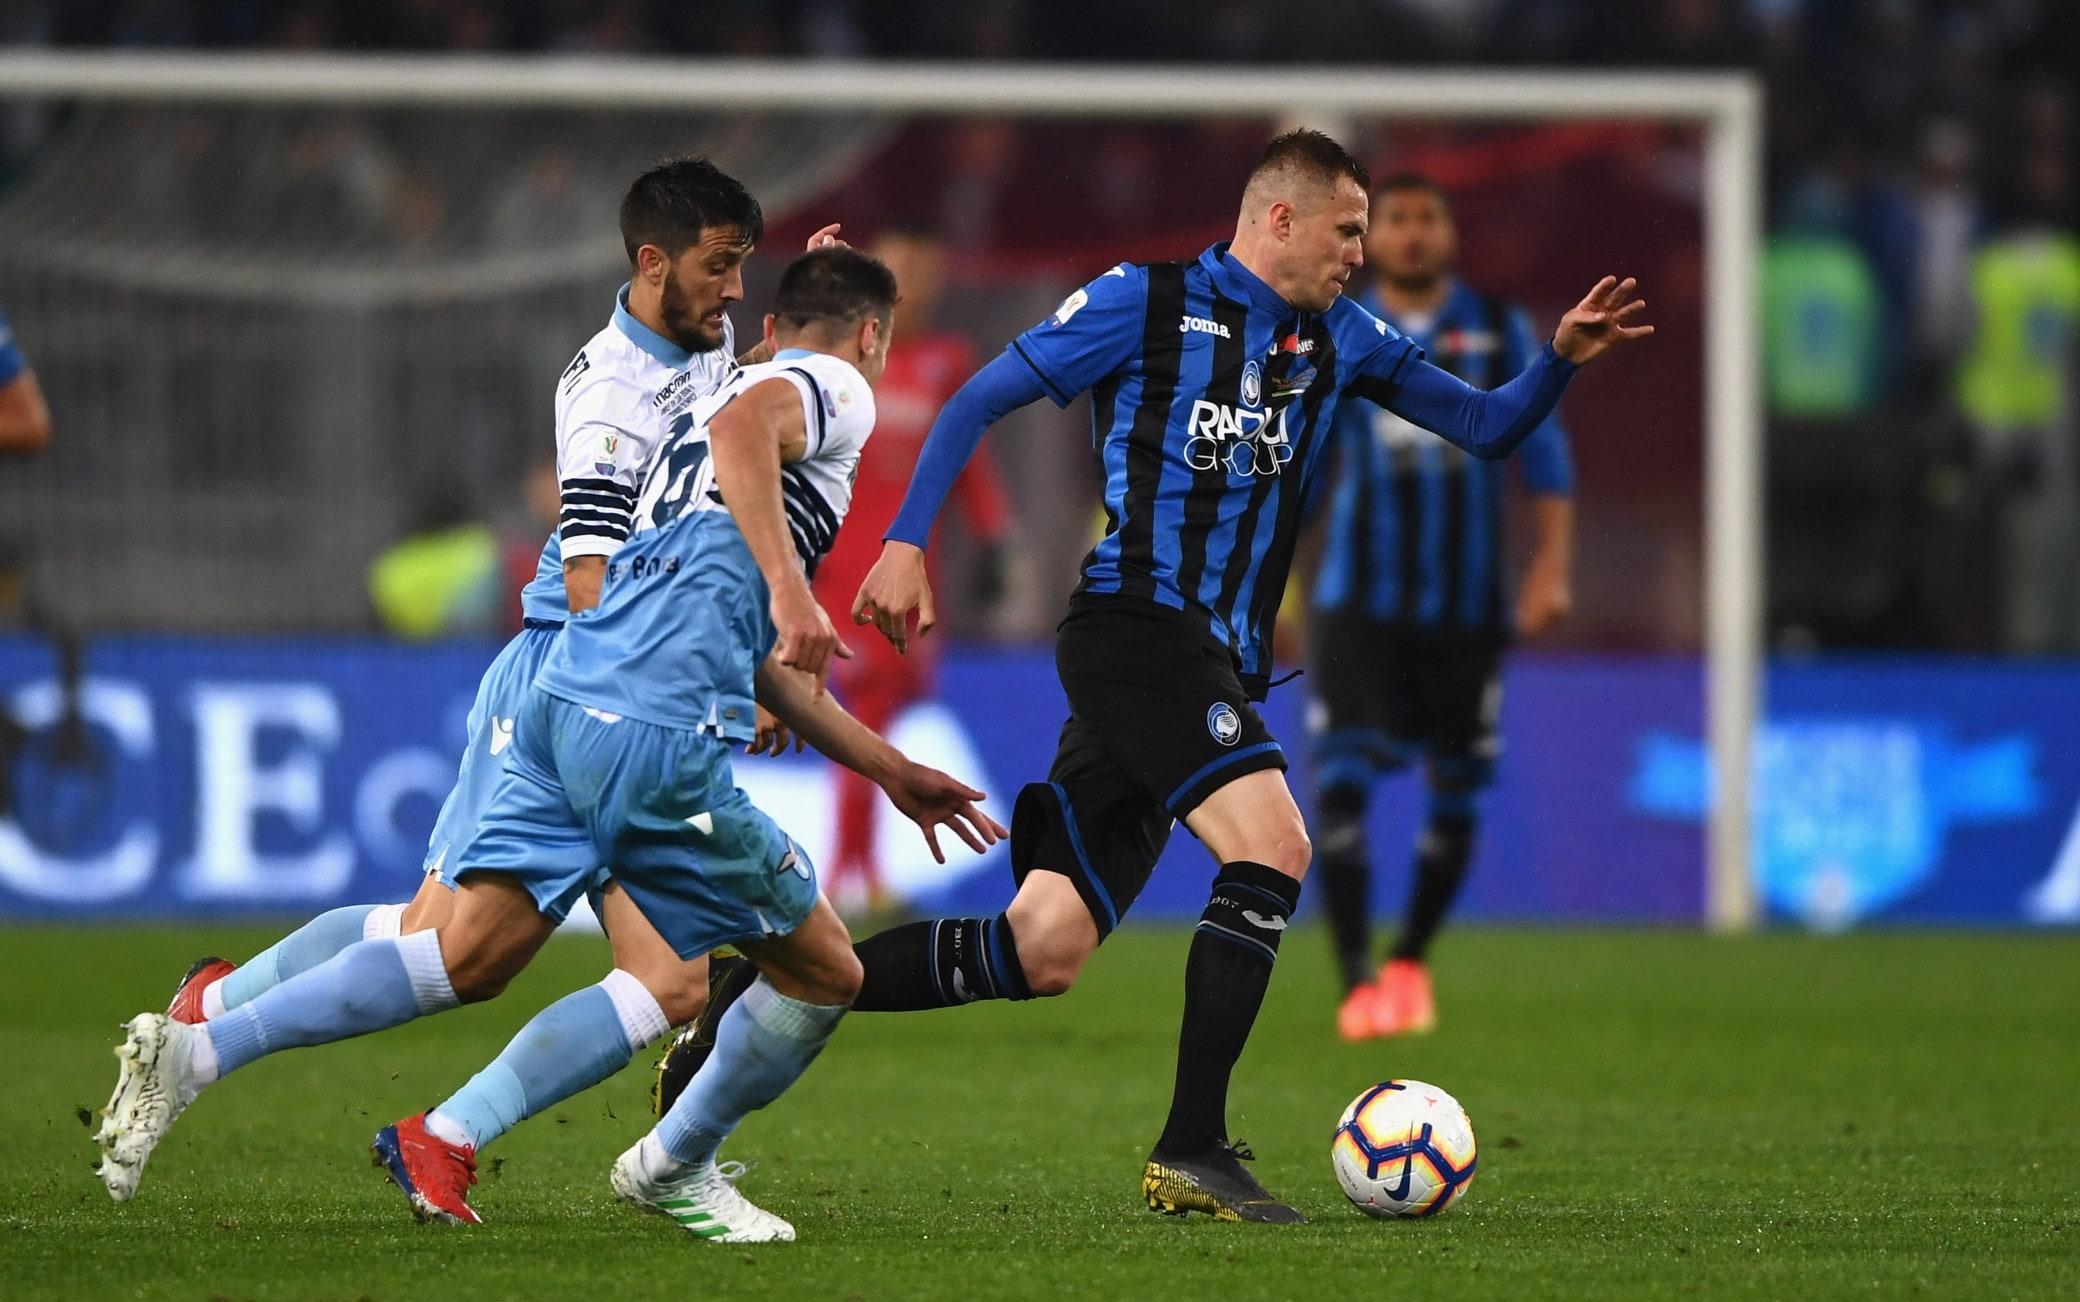 Lazio-Atalanta, Inzaghi: